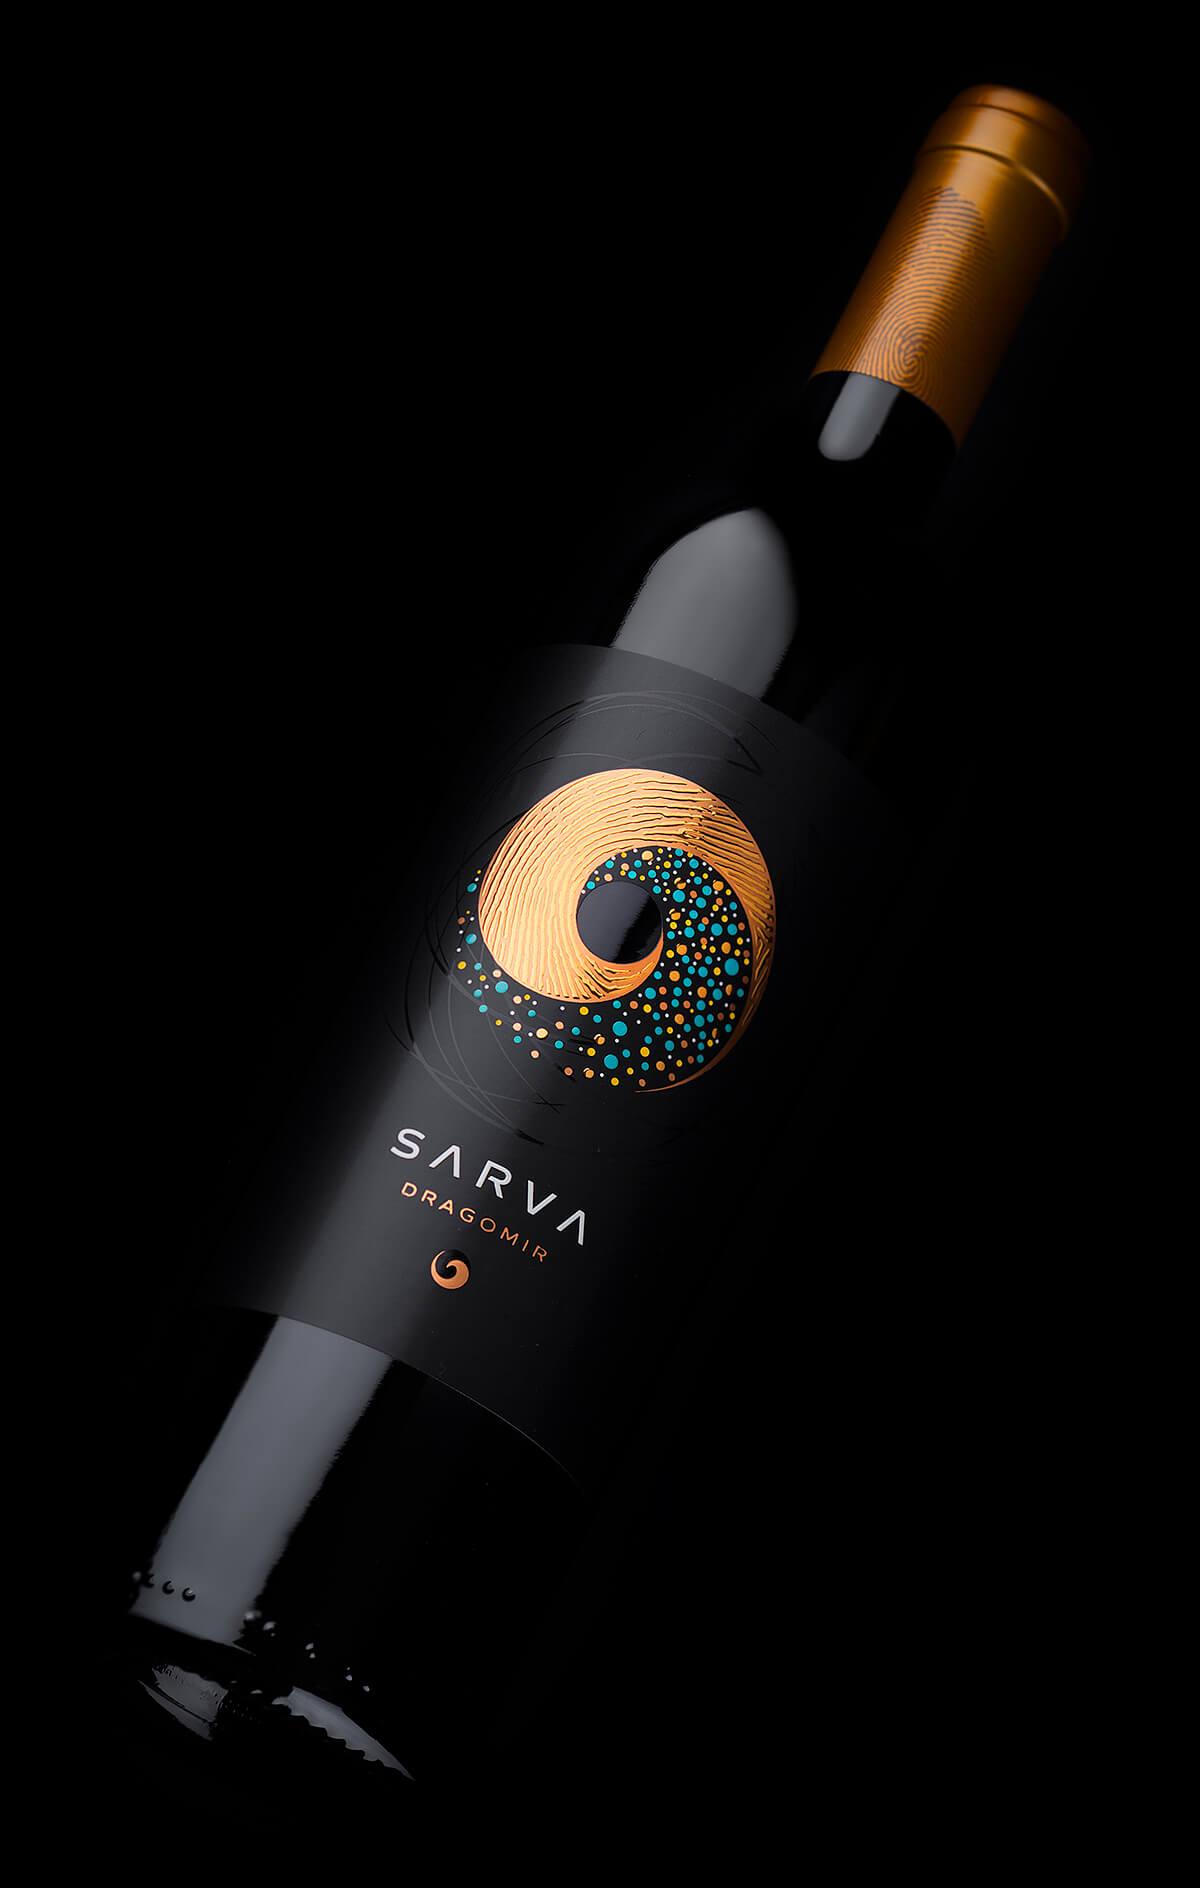 intricate wine label design